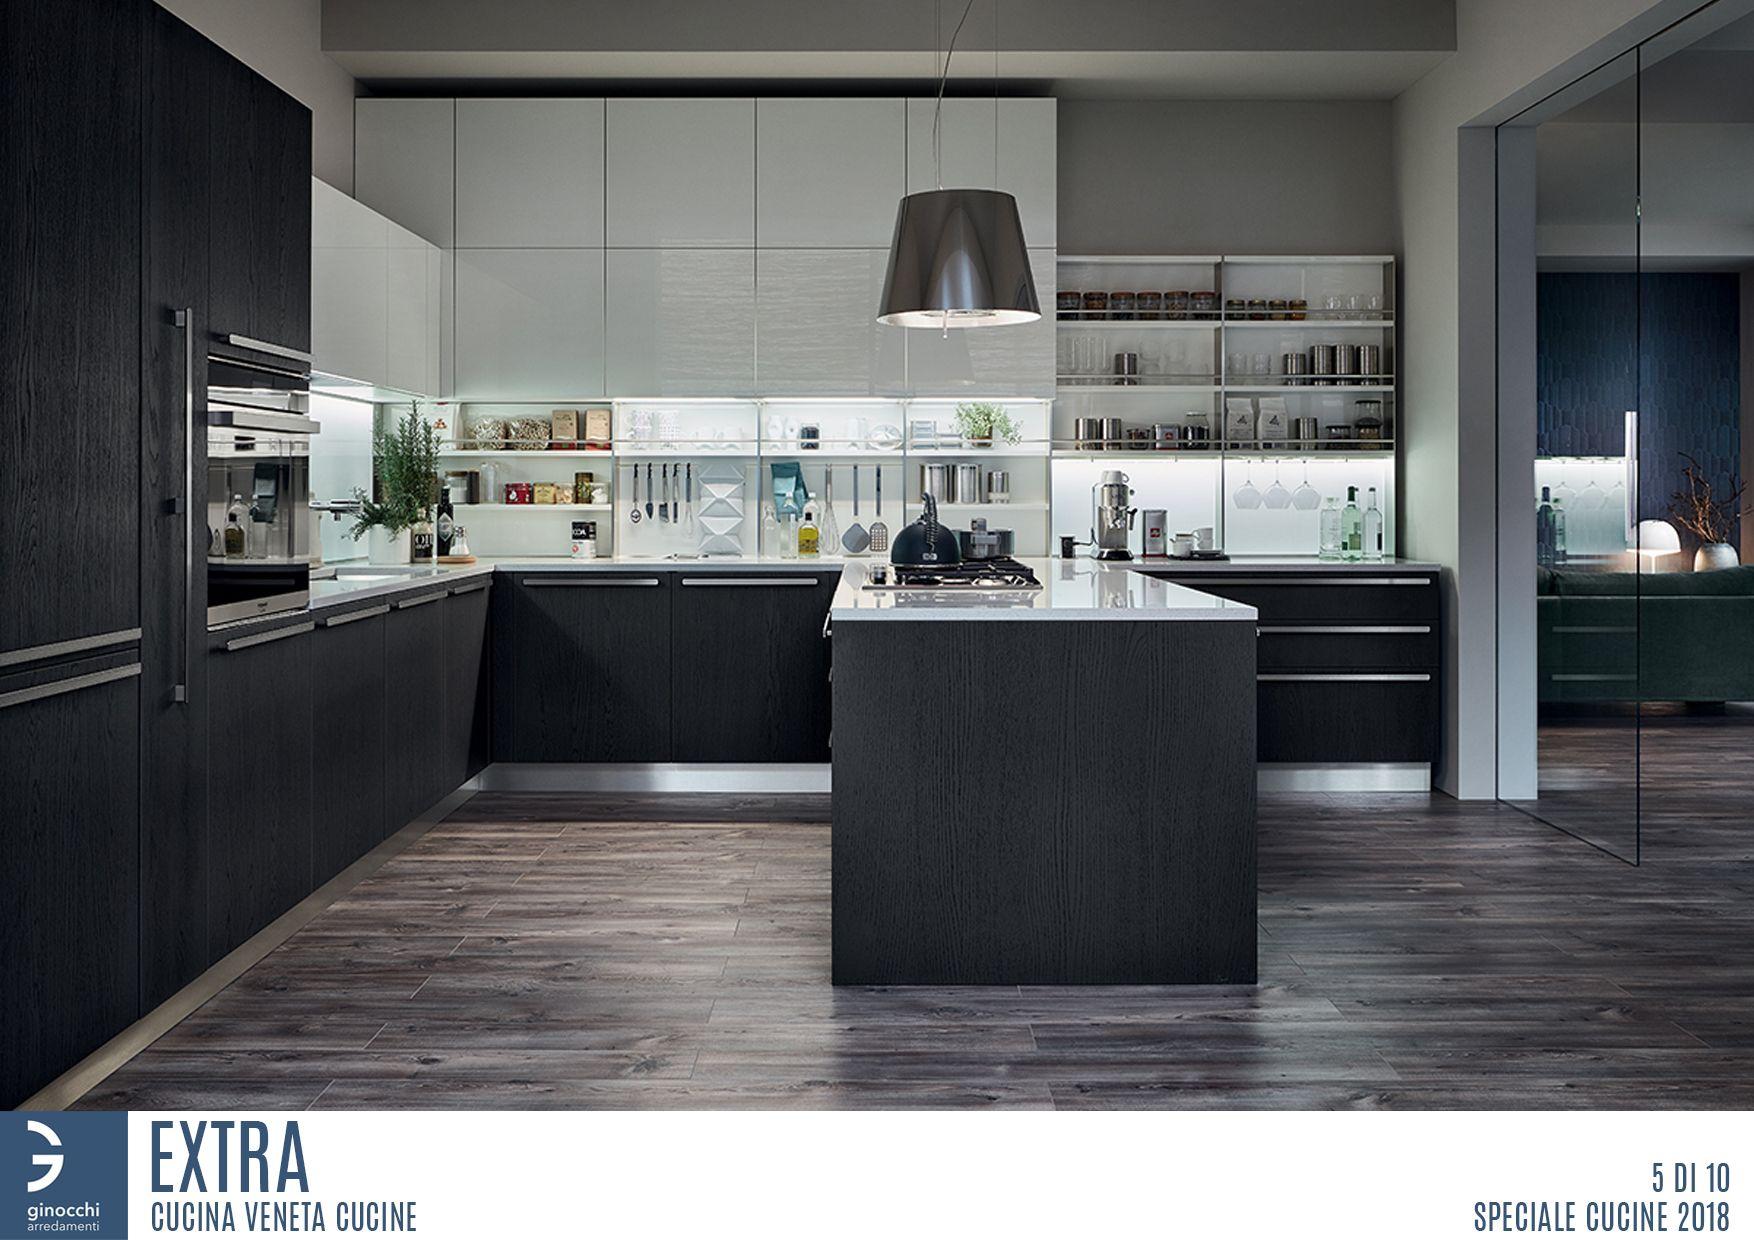 Catalogo Speciale Cucine Moderne 2018 - Ginocchi Arredamenti ...